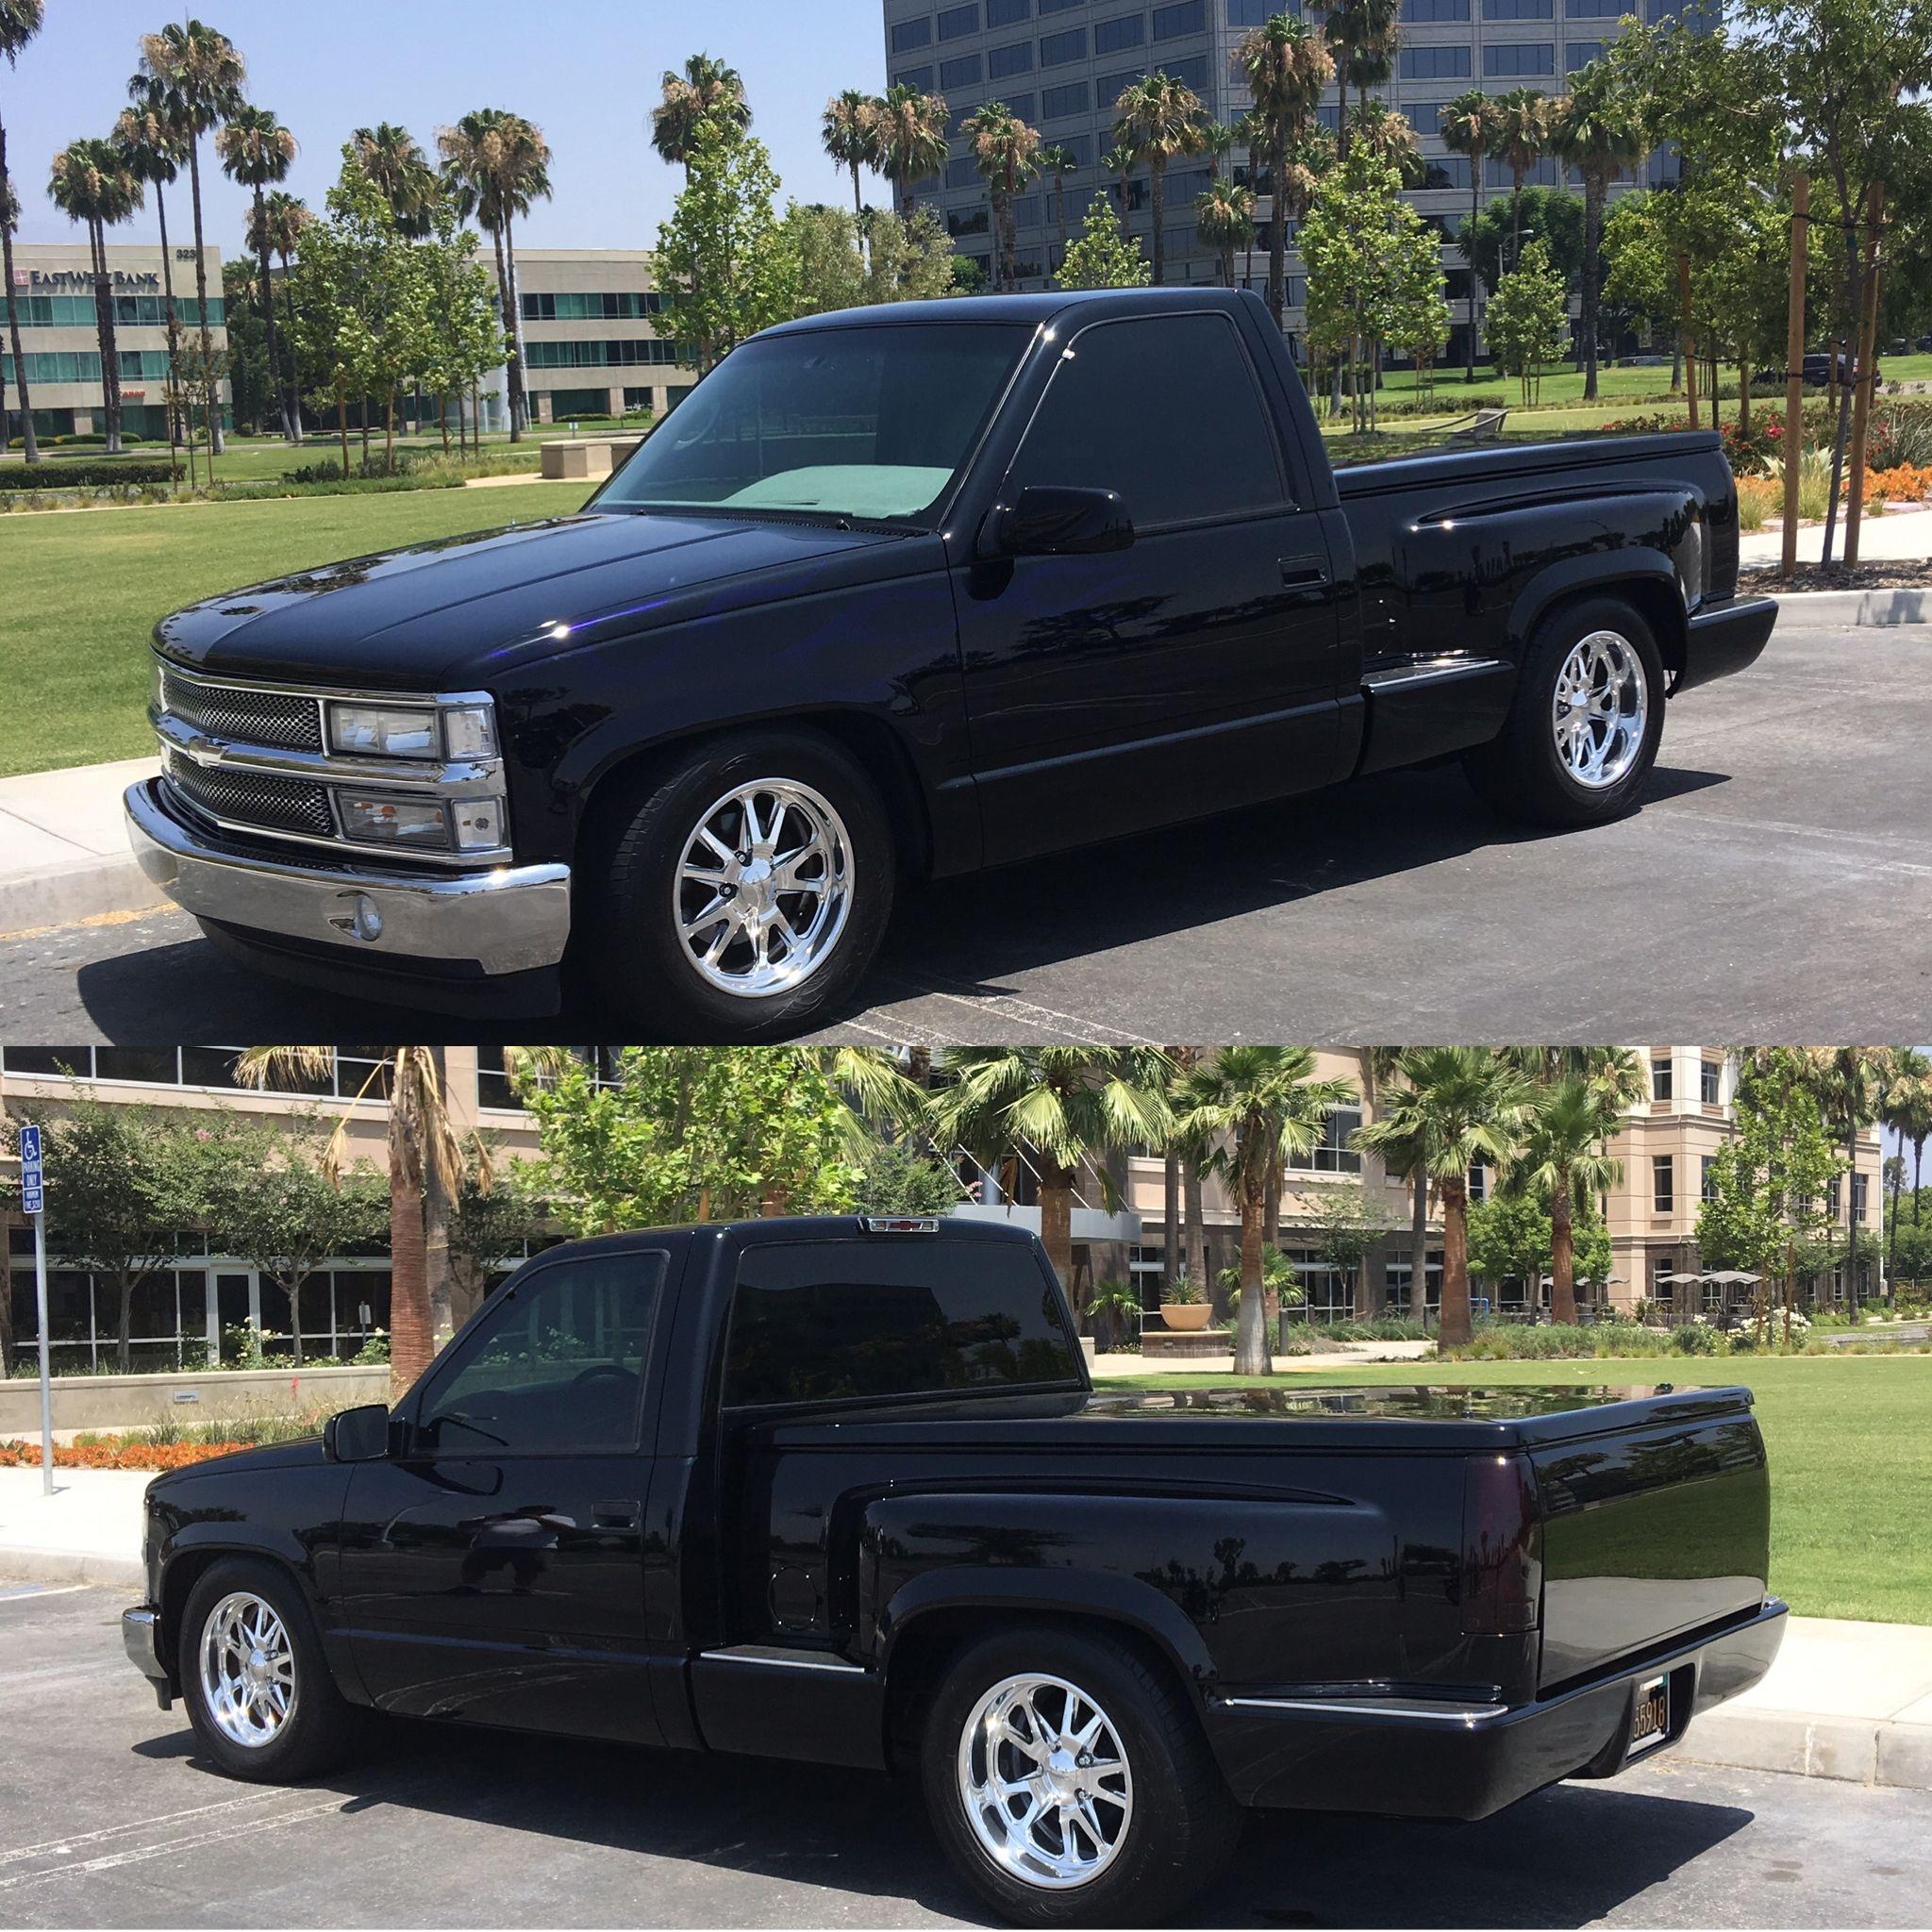 96 stepside 1999 chevy silverado chevy s10 gm trucks chevy trucks car [ 2048 x 2048 Pixel ]